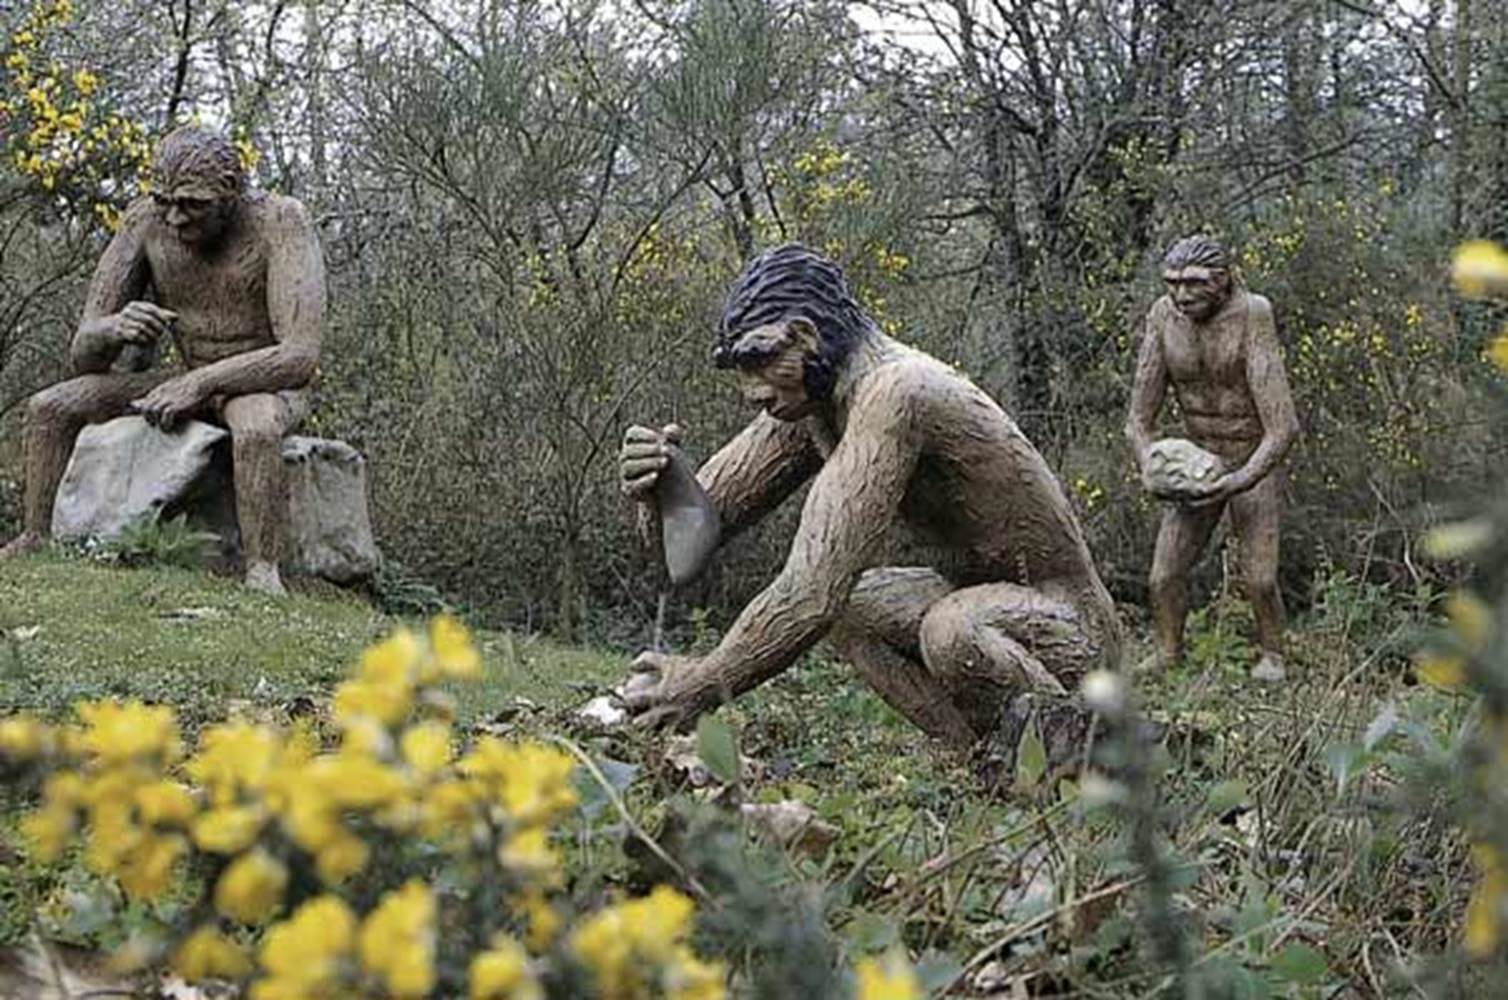 parc de prehistoire de bretagne - malansac - morbihan bretagne sud © OT Vannes